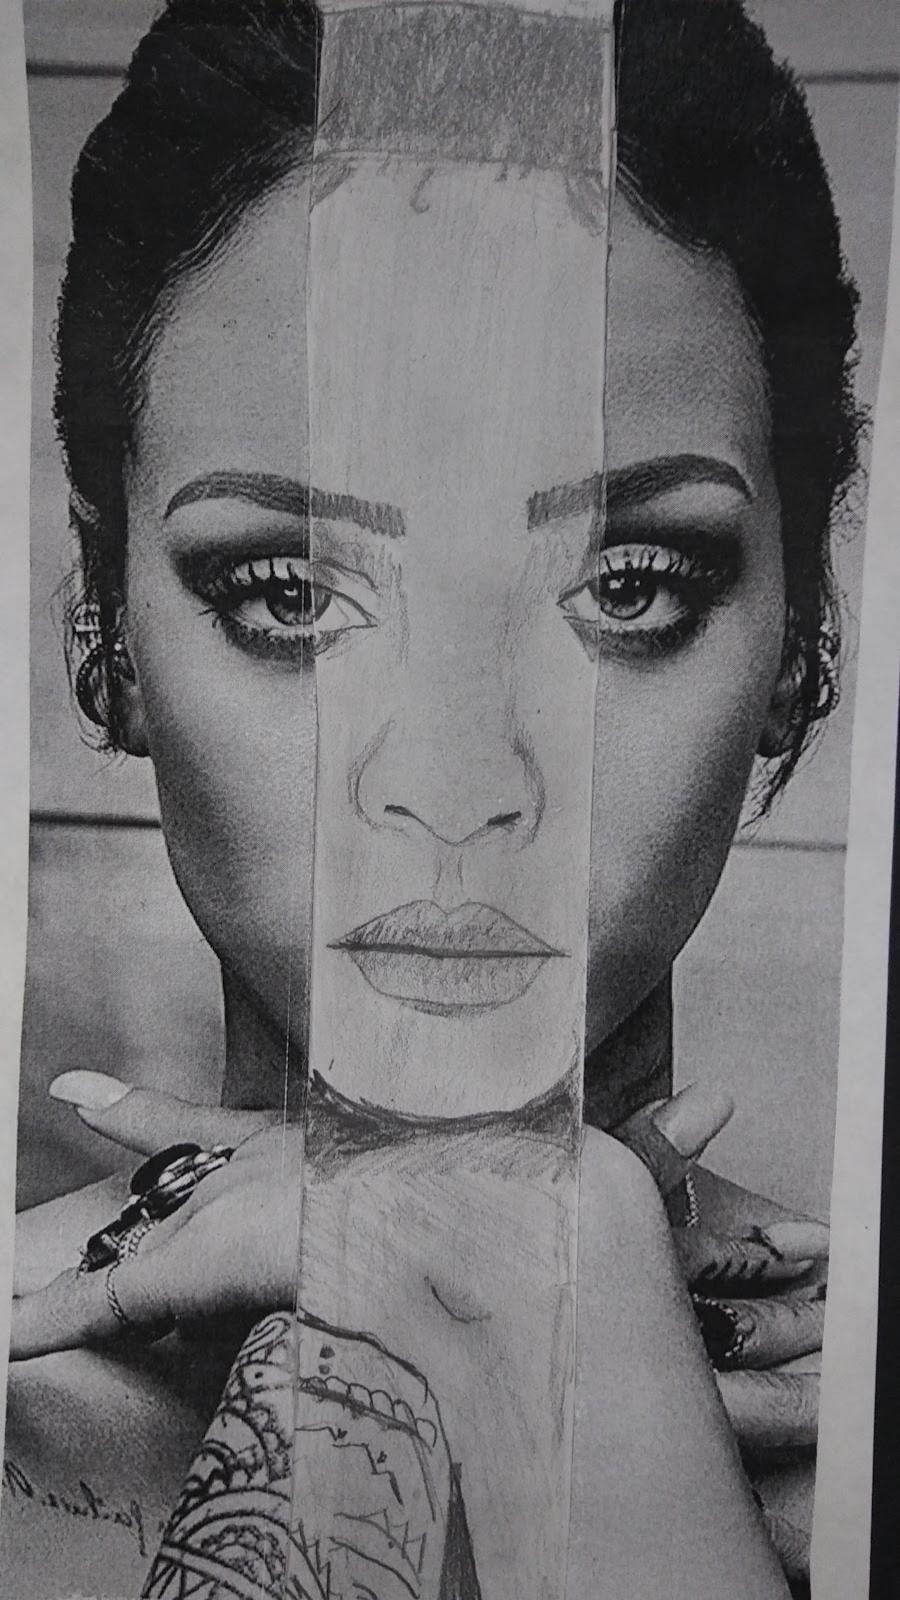 Landmark Student Portrait of Rihanna